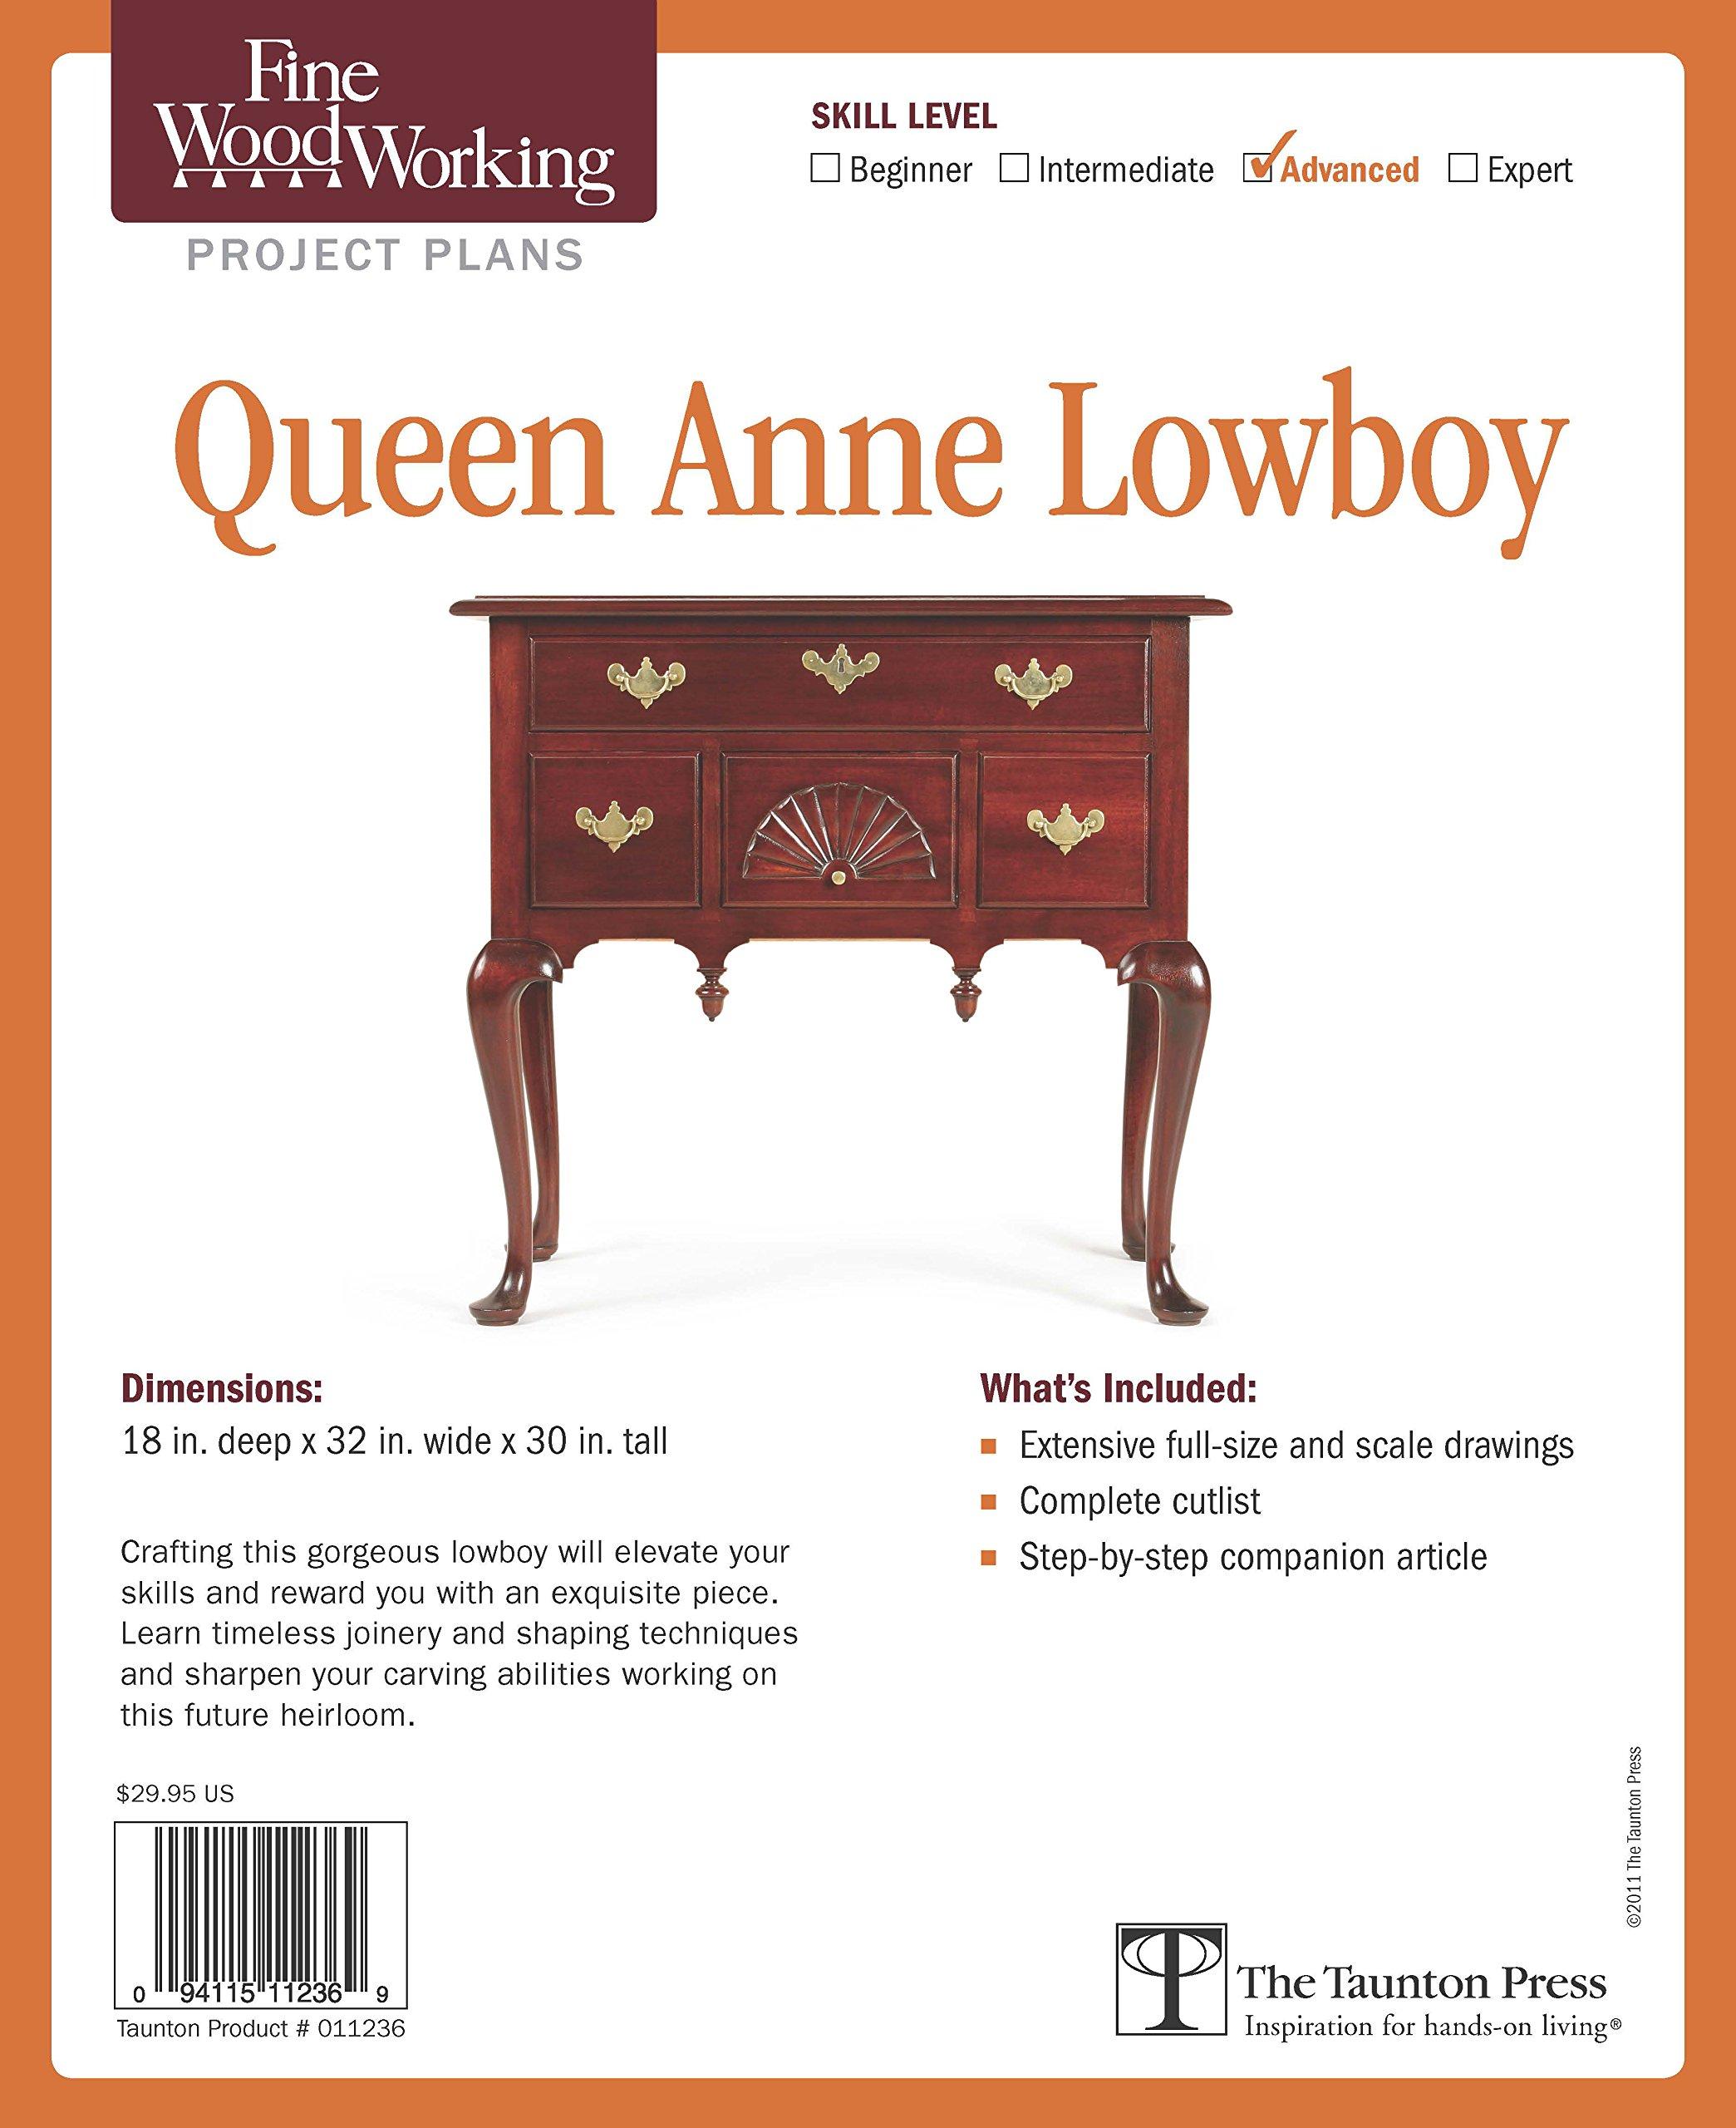 Fine Woodworking's Queen Anne Lowboy Plan (Fine Woodworking Project Plans)